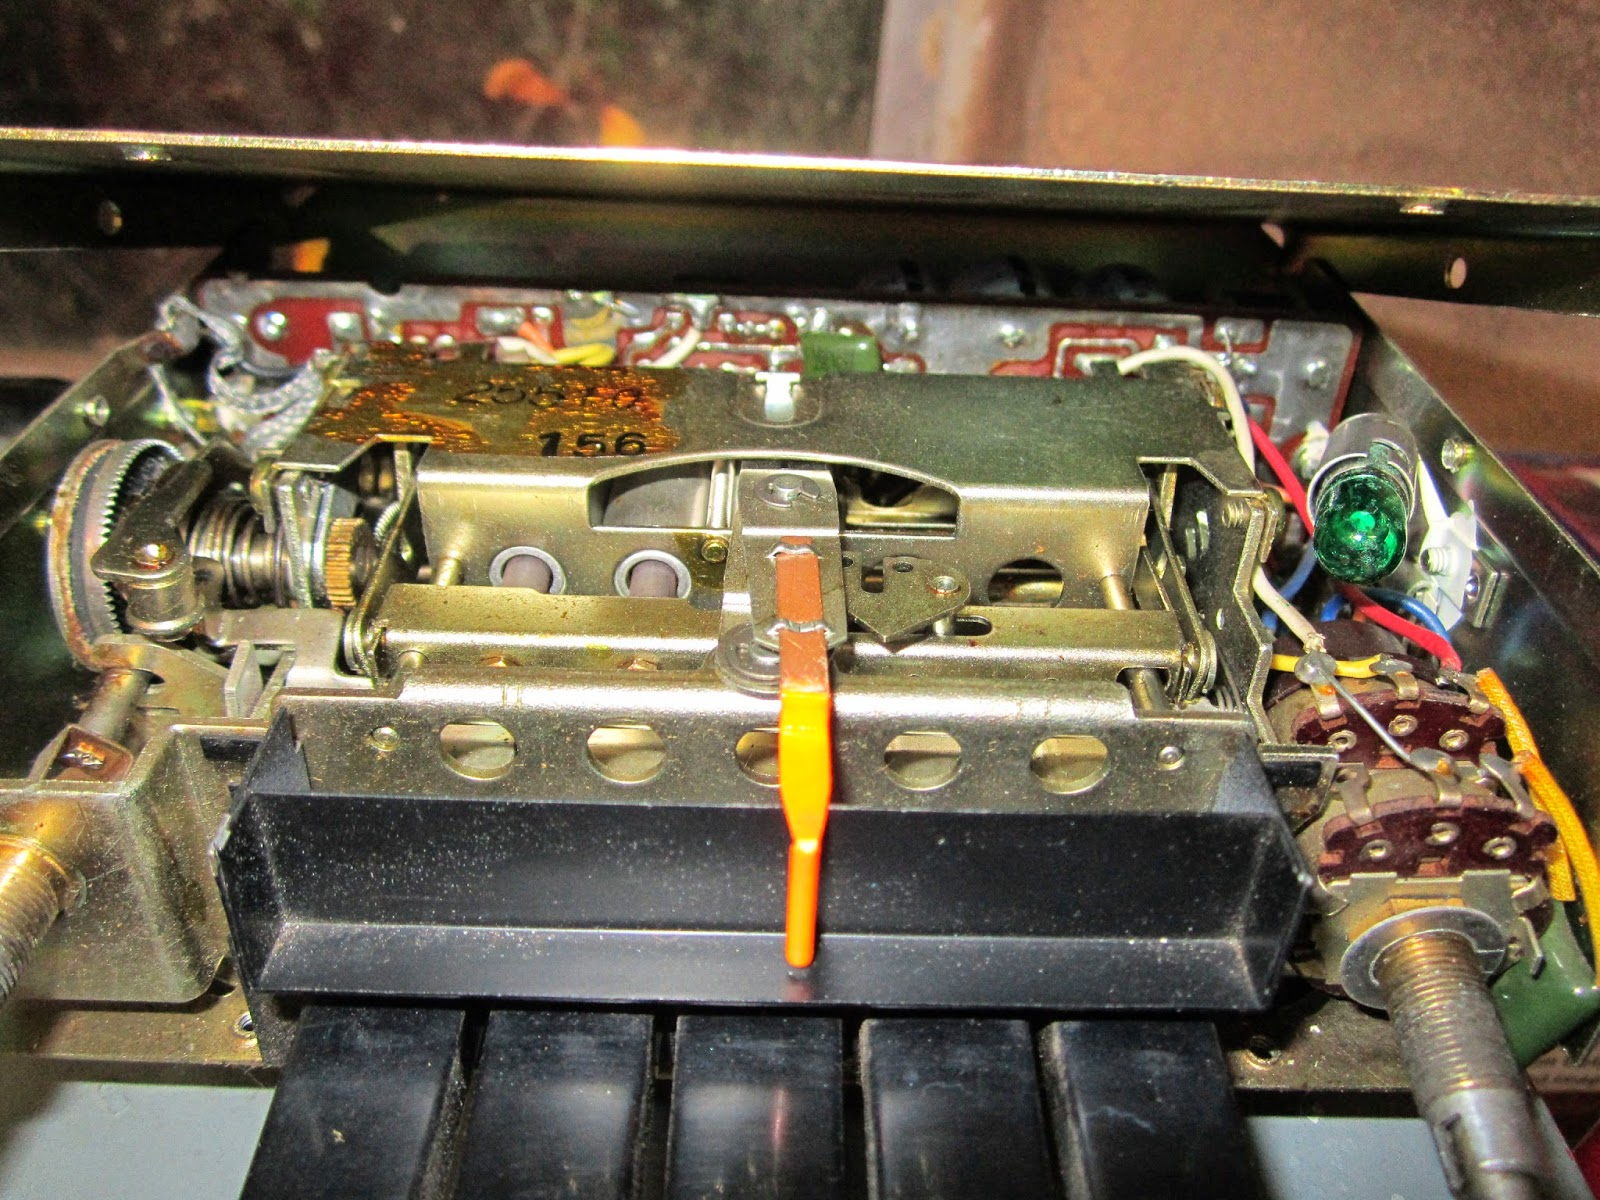 restoration volvo 122s 1969 dashboard lights in the volvo. Black Bedroom Furniture Sets. Home Design Ideas